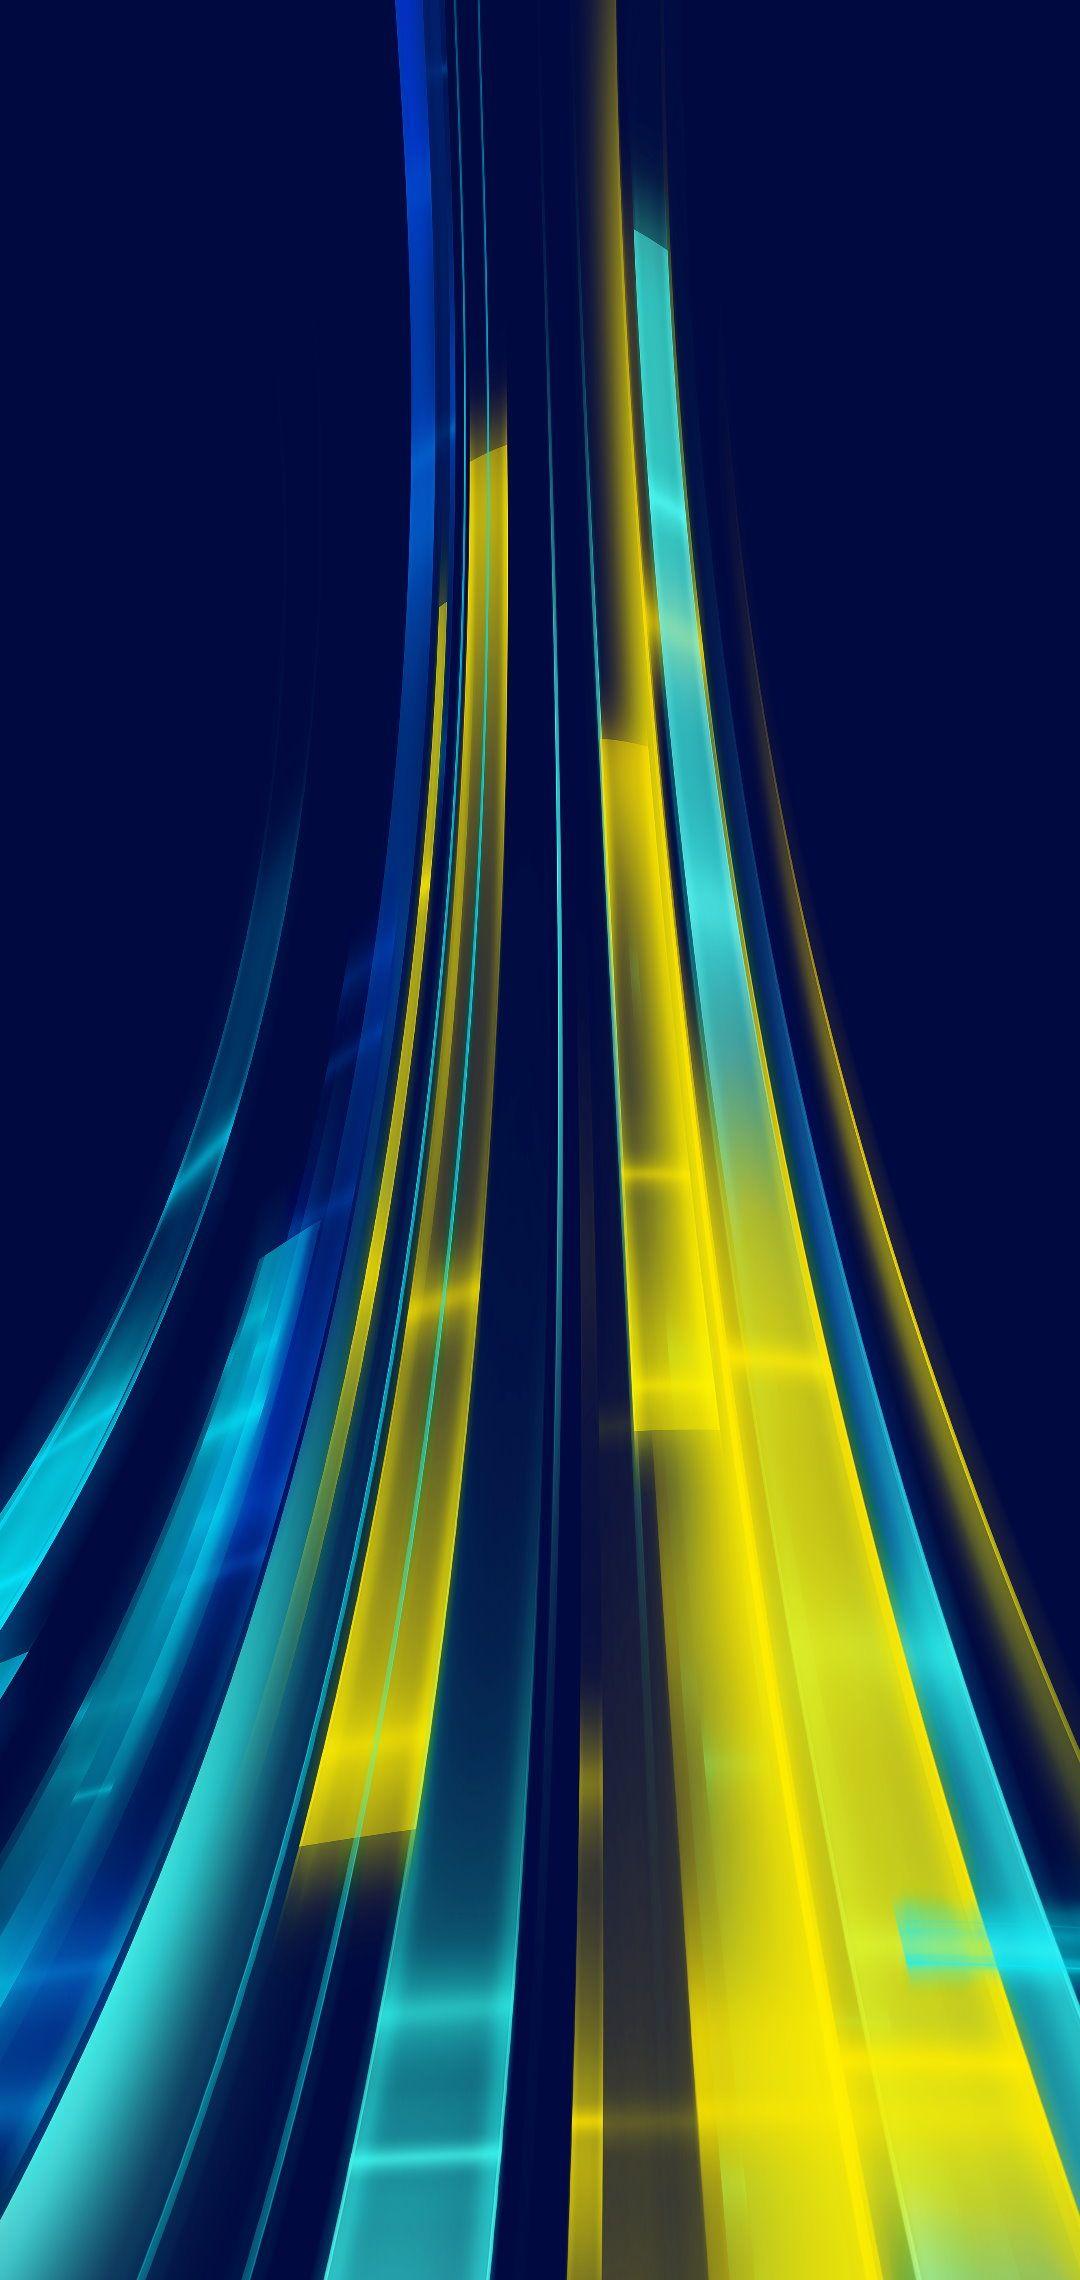 Wallpapers Samsung Galaxy Note 10 en 2020 Idées de